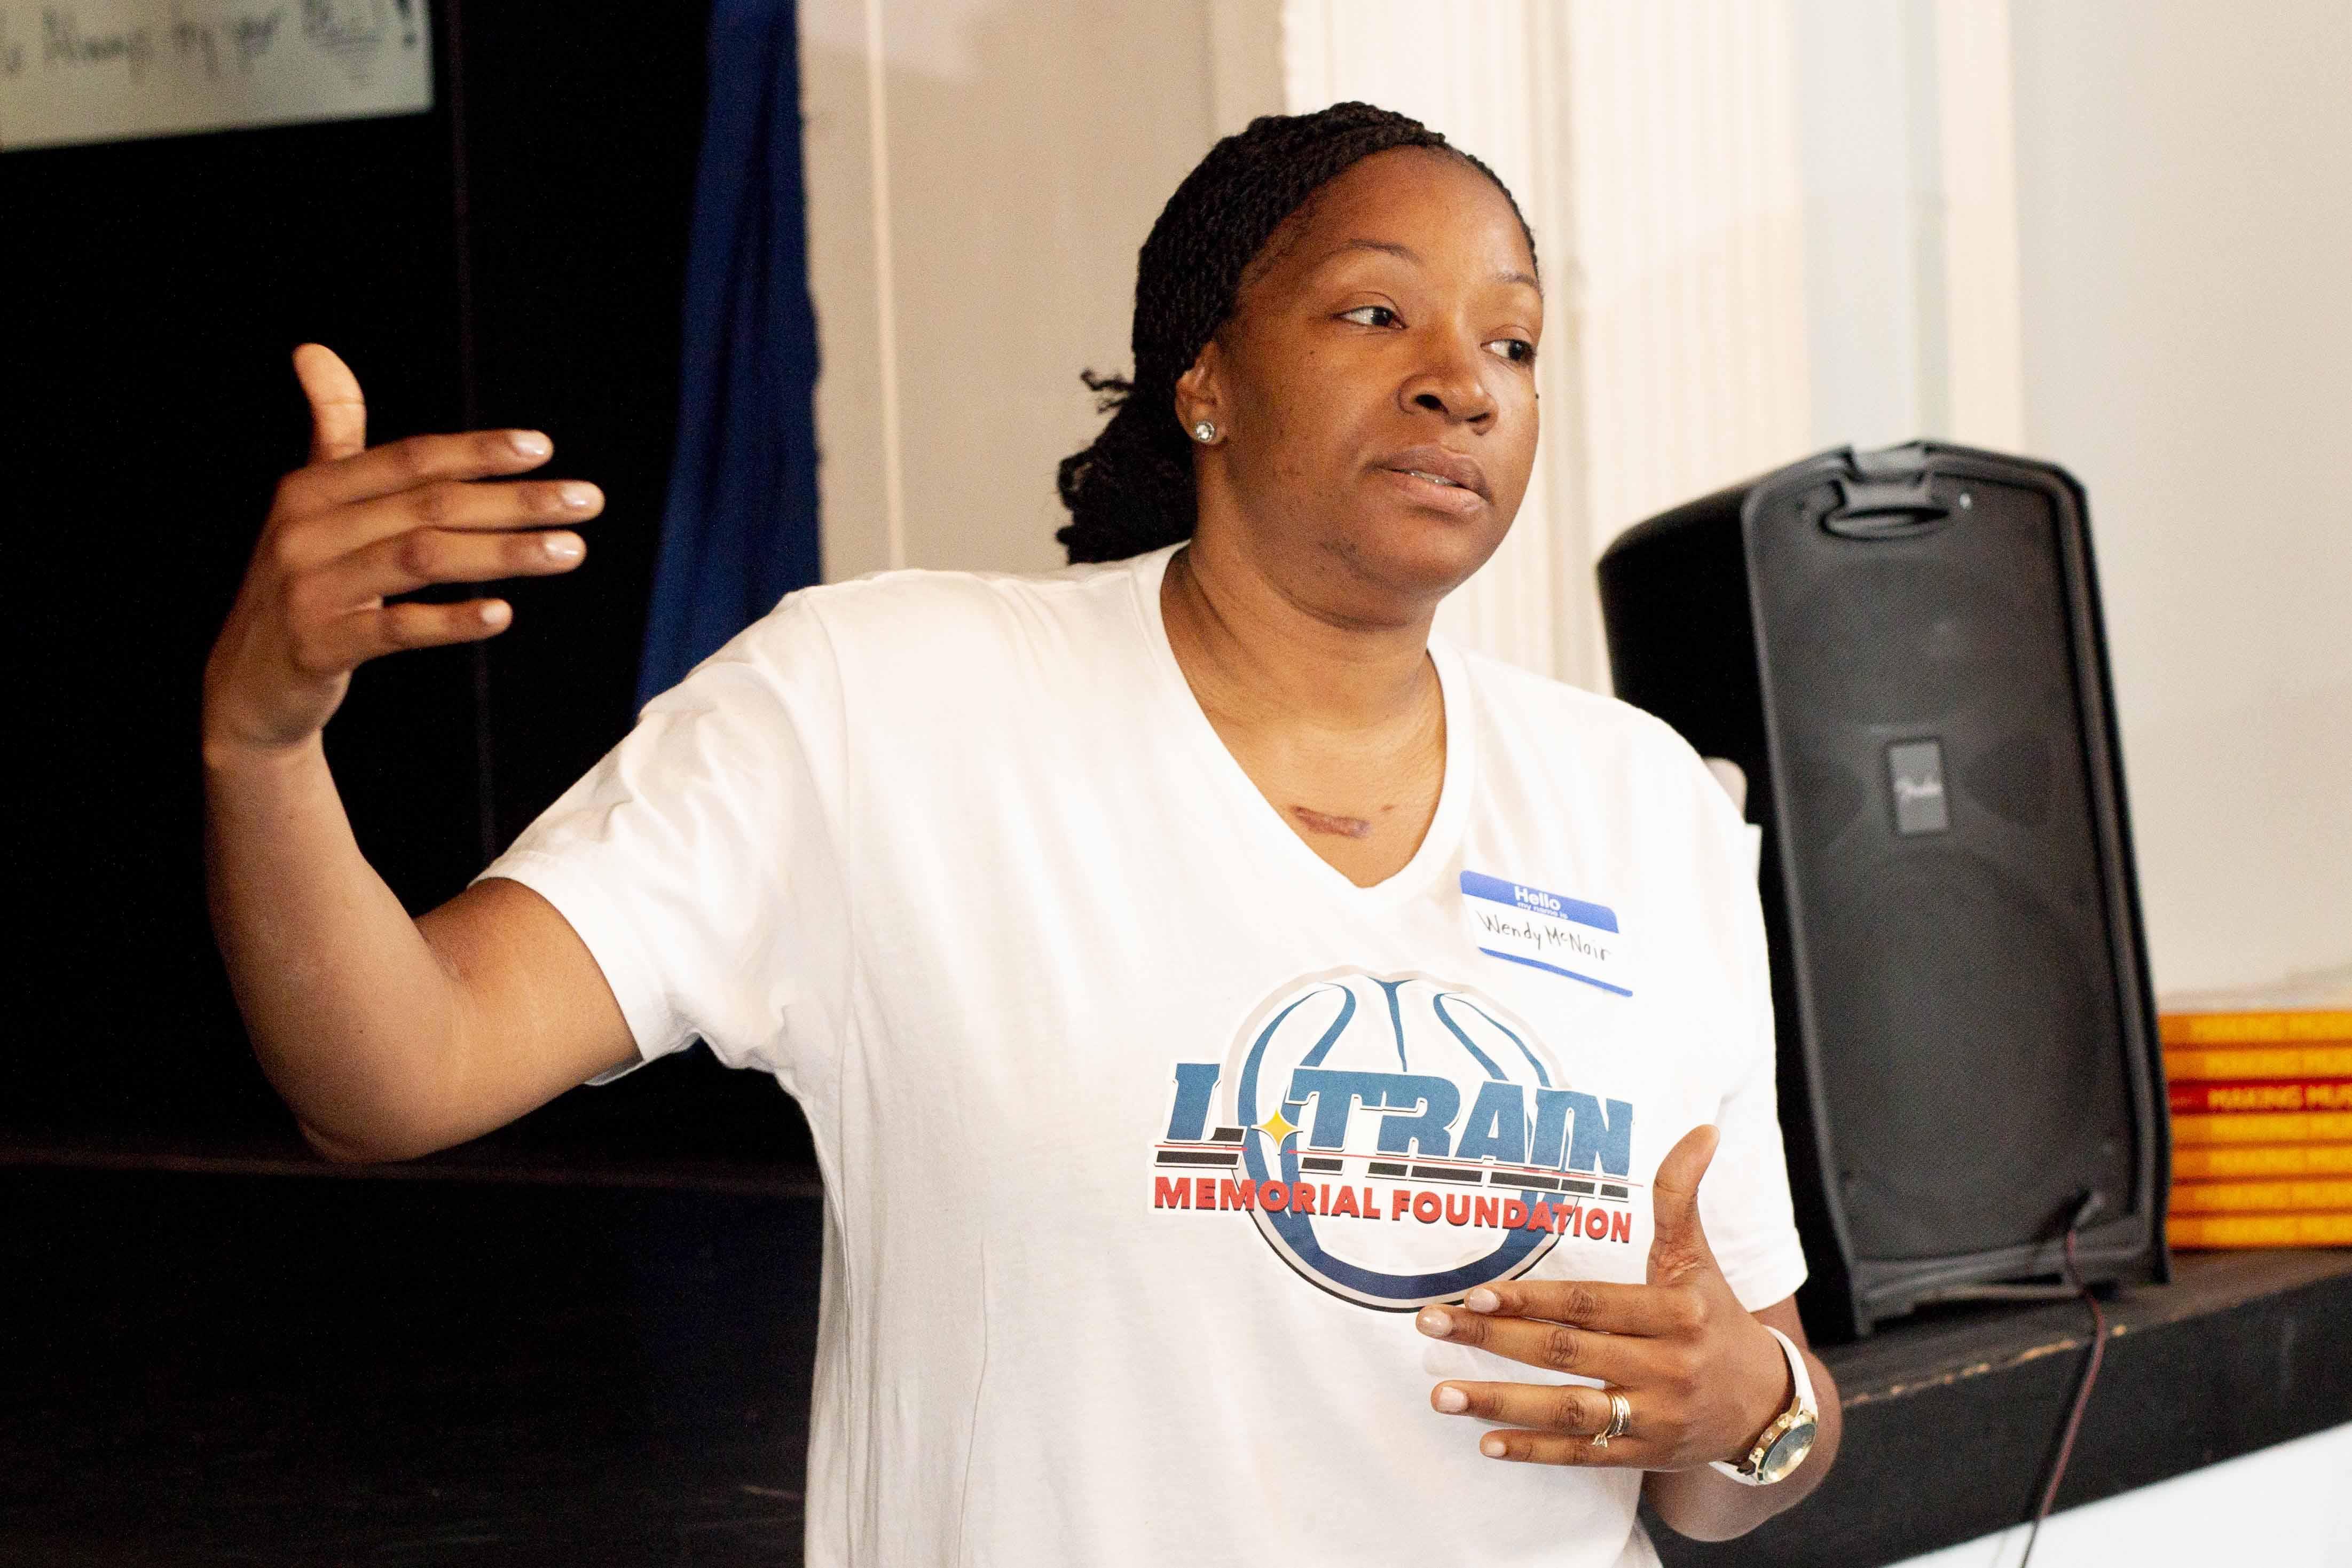 L-Train Memorial - #SupportASon (Heywood Avenue Elementary School, Orange NJ) 06-09-18_0014